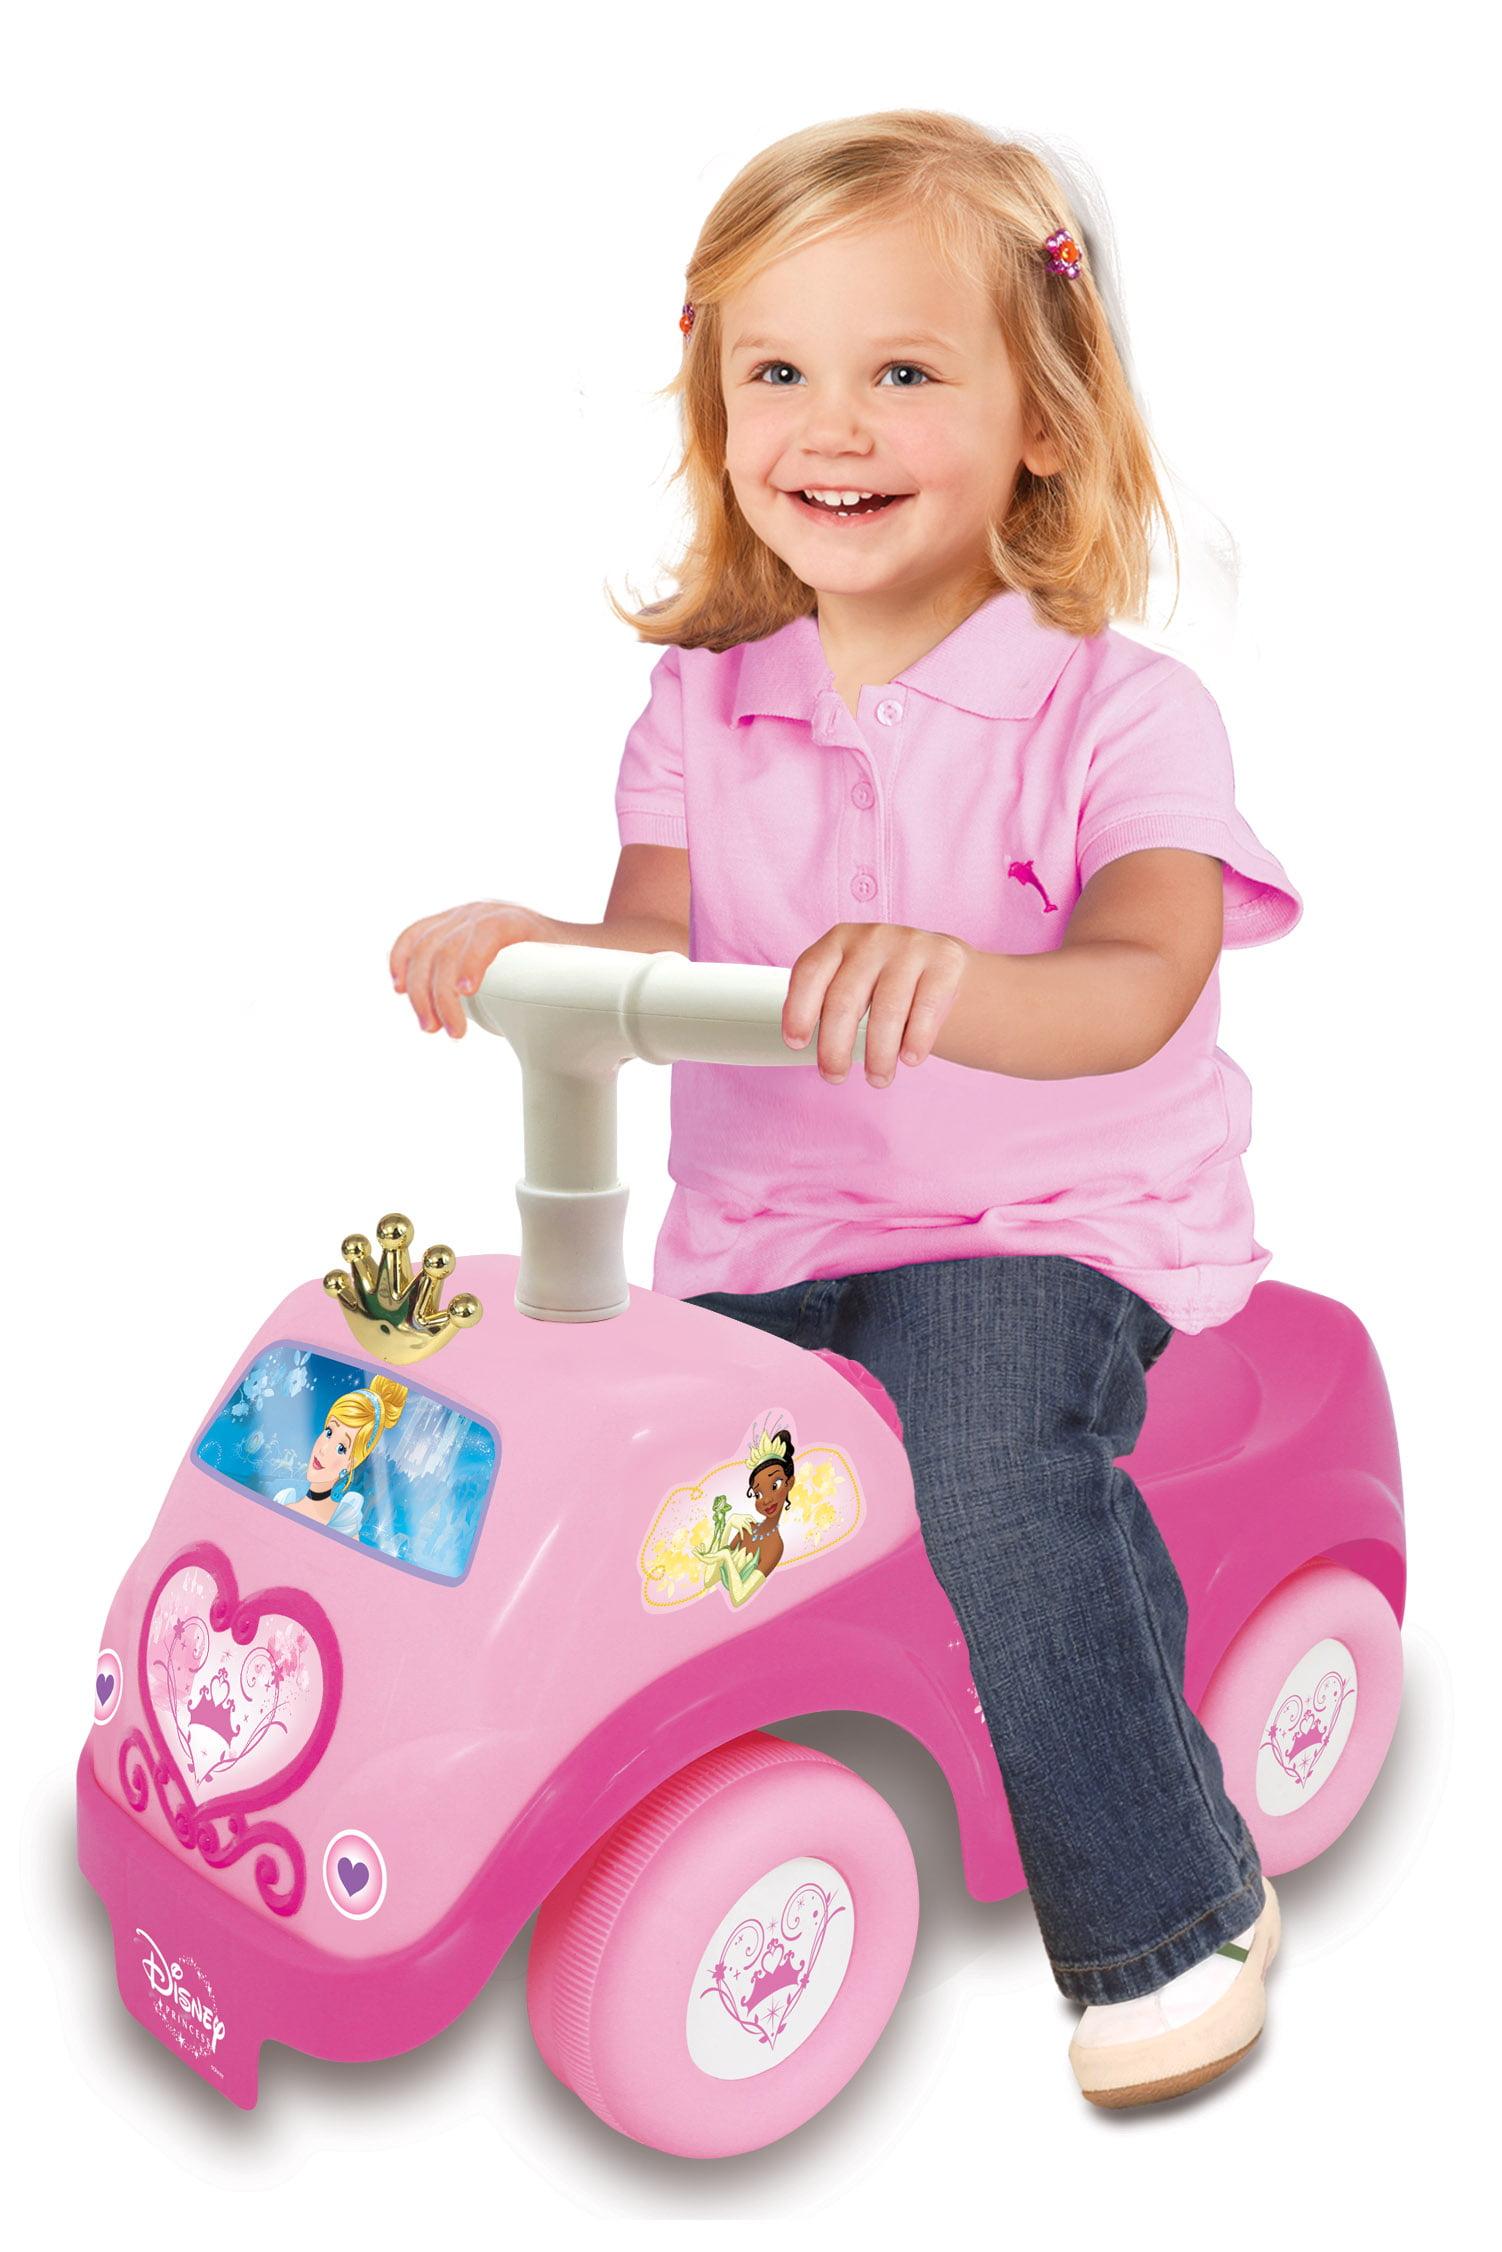 Disney Princess Lights n' Sound Activity Ride On